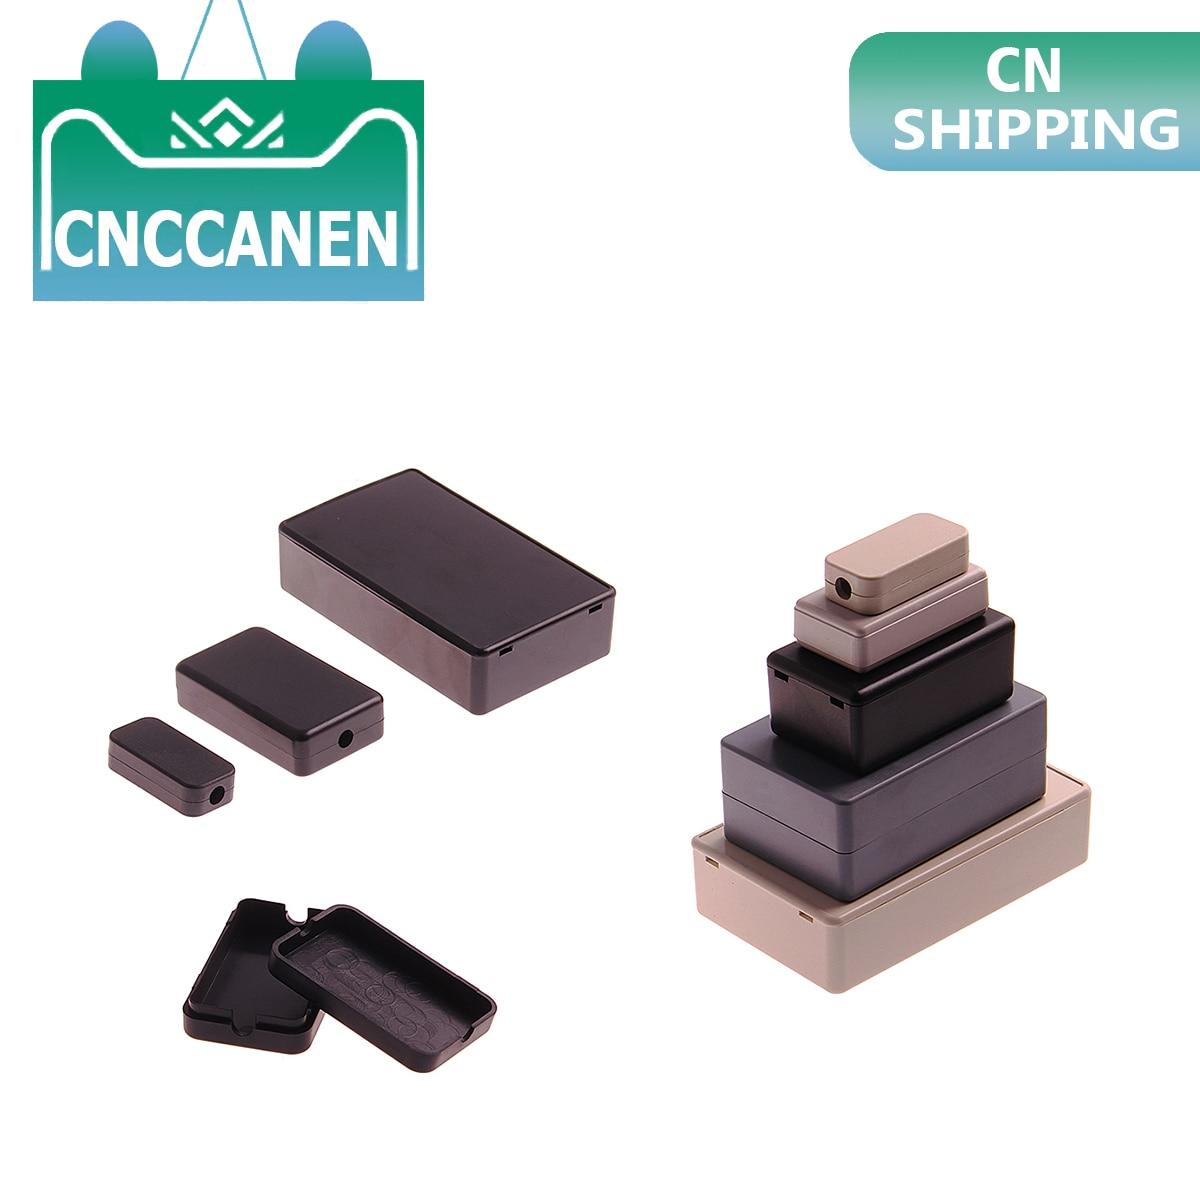 1PC Nieuwe DIY Behuizing Instrument Case Zwart Wit ABS Plastic Project Box Storage Case Behuizing Dozen Elektronische Benodigdheden